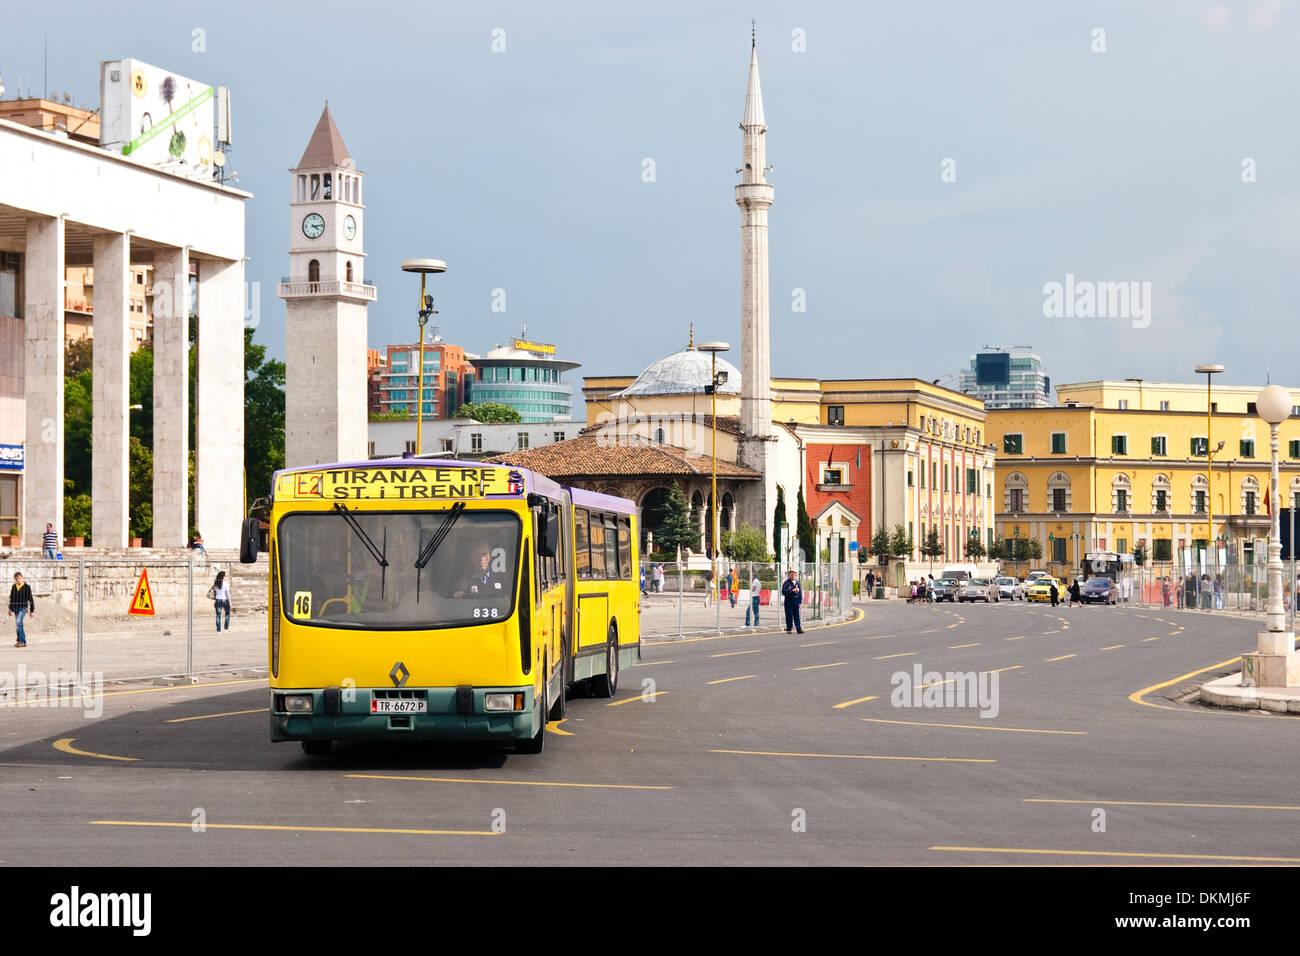 Skanderbeg Square, Tirana, Albania - Stock Image